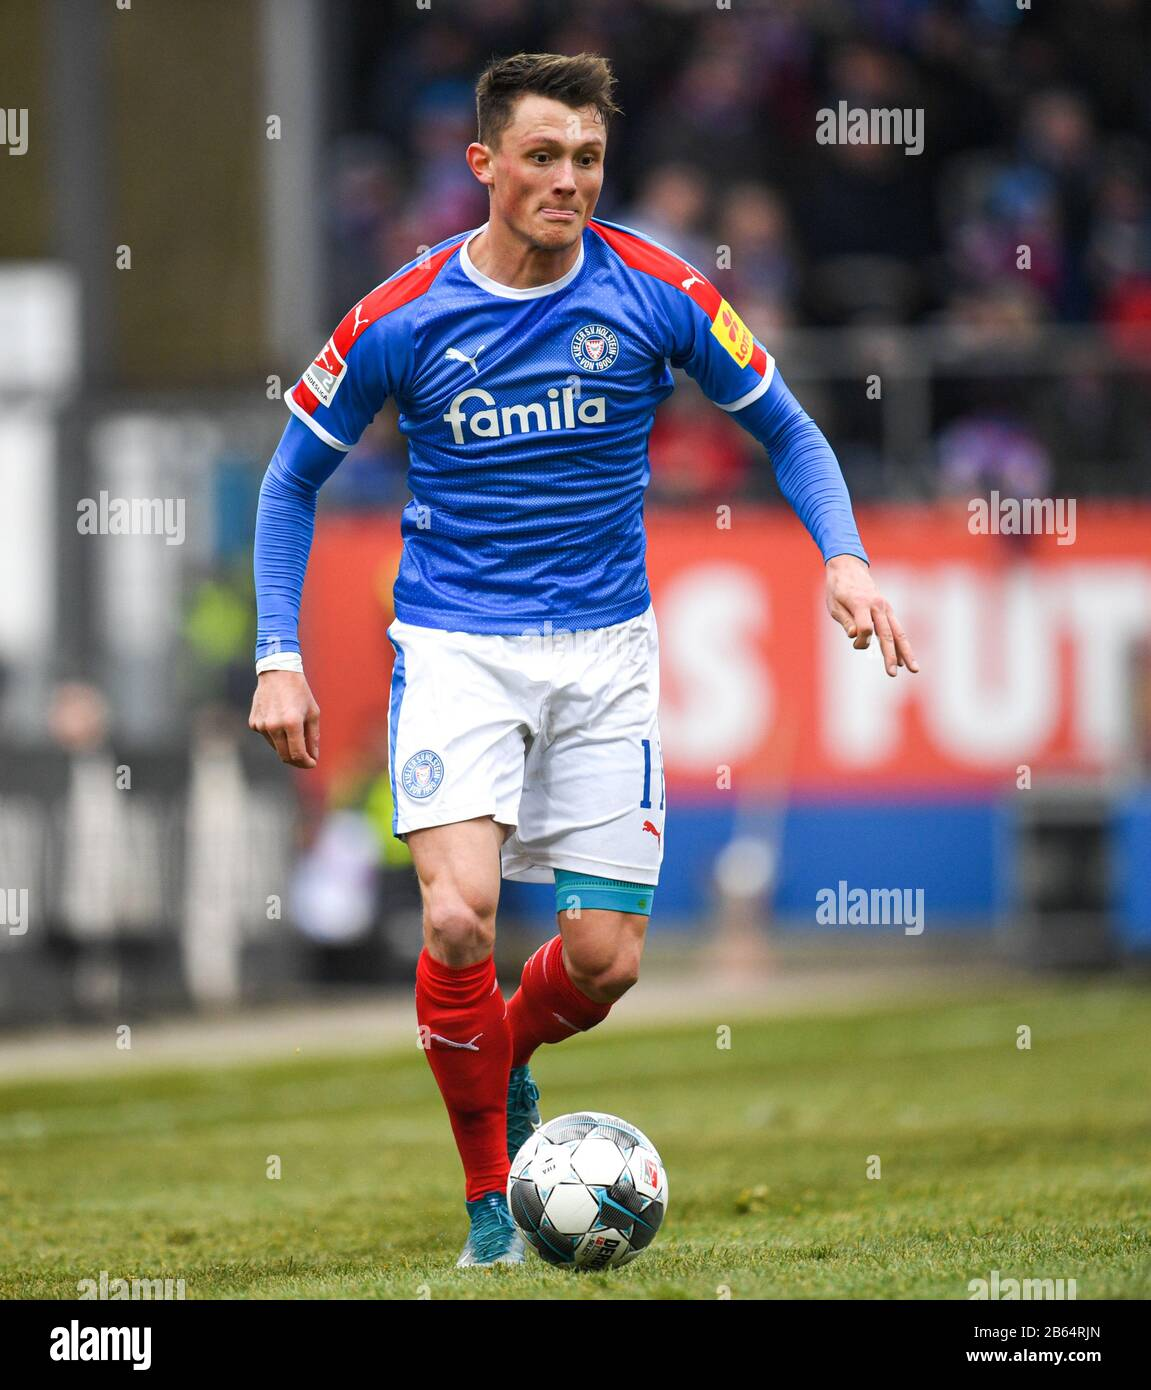 Kiel Germany 08th Mar 2020 Football 2nd Bundesliga 25th Matchday Holstein Kiel Spvgg Greuther Furth At